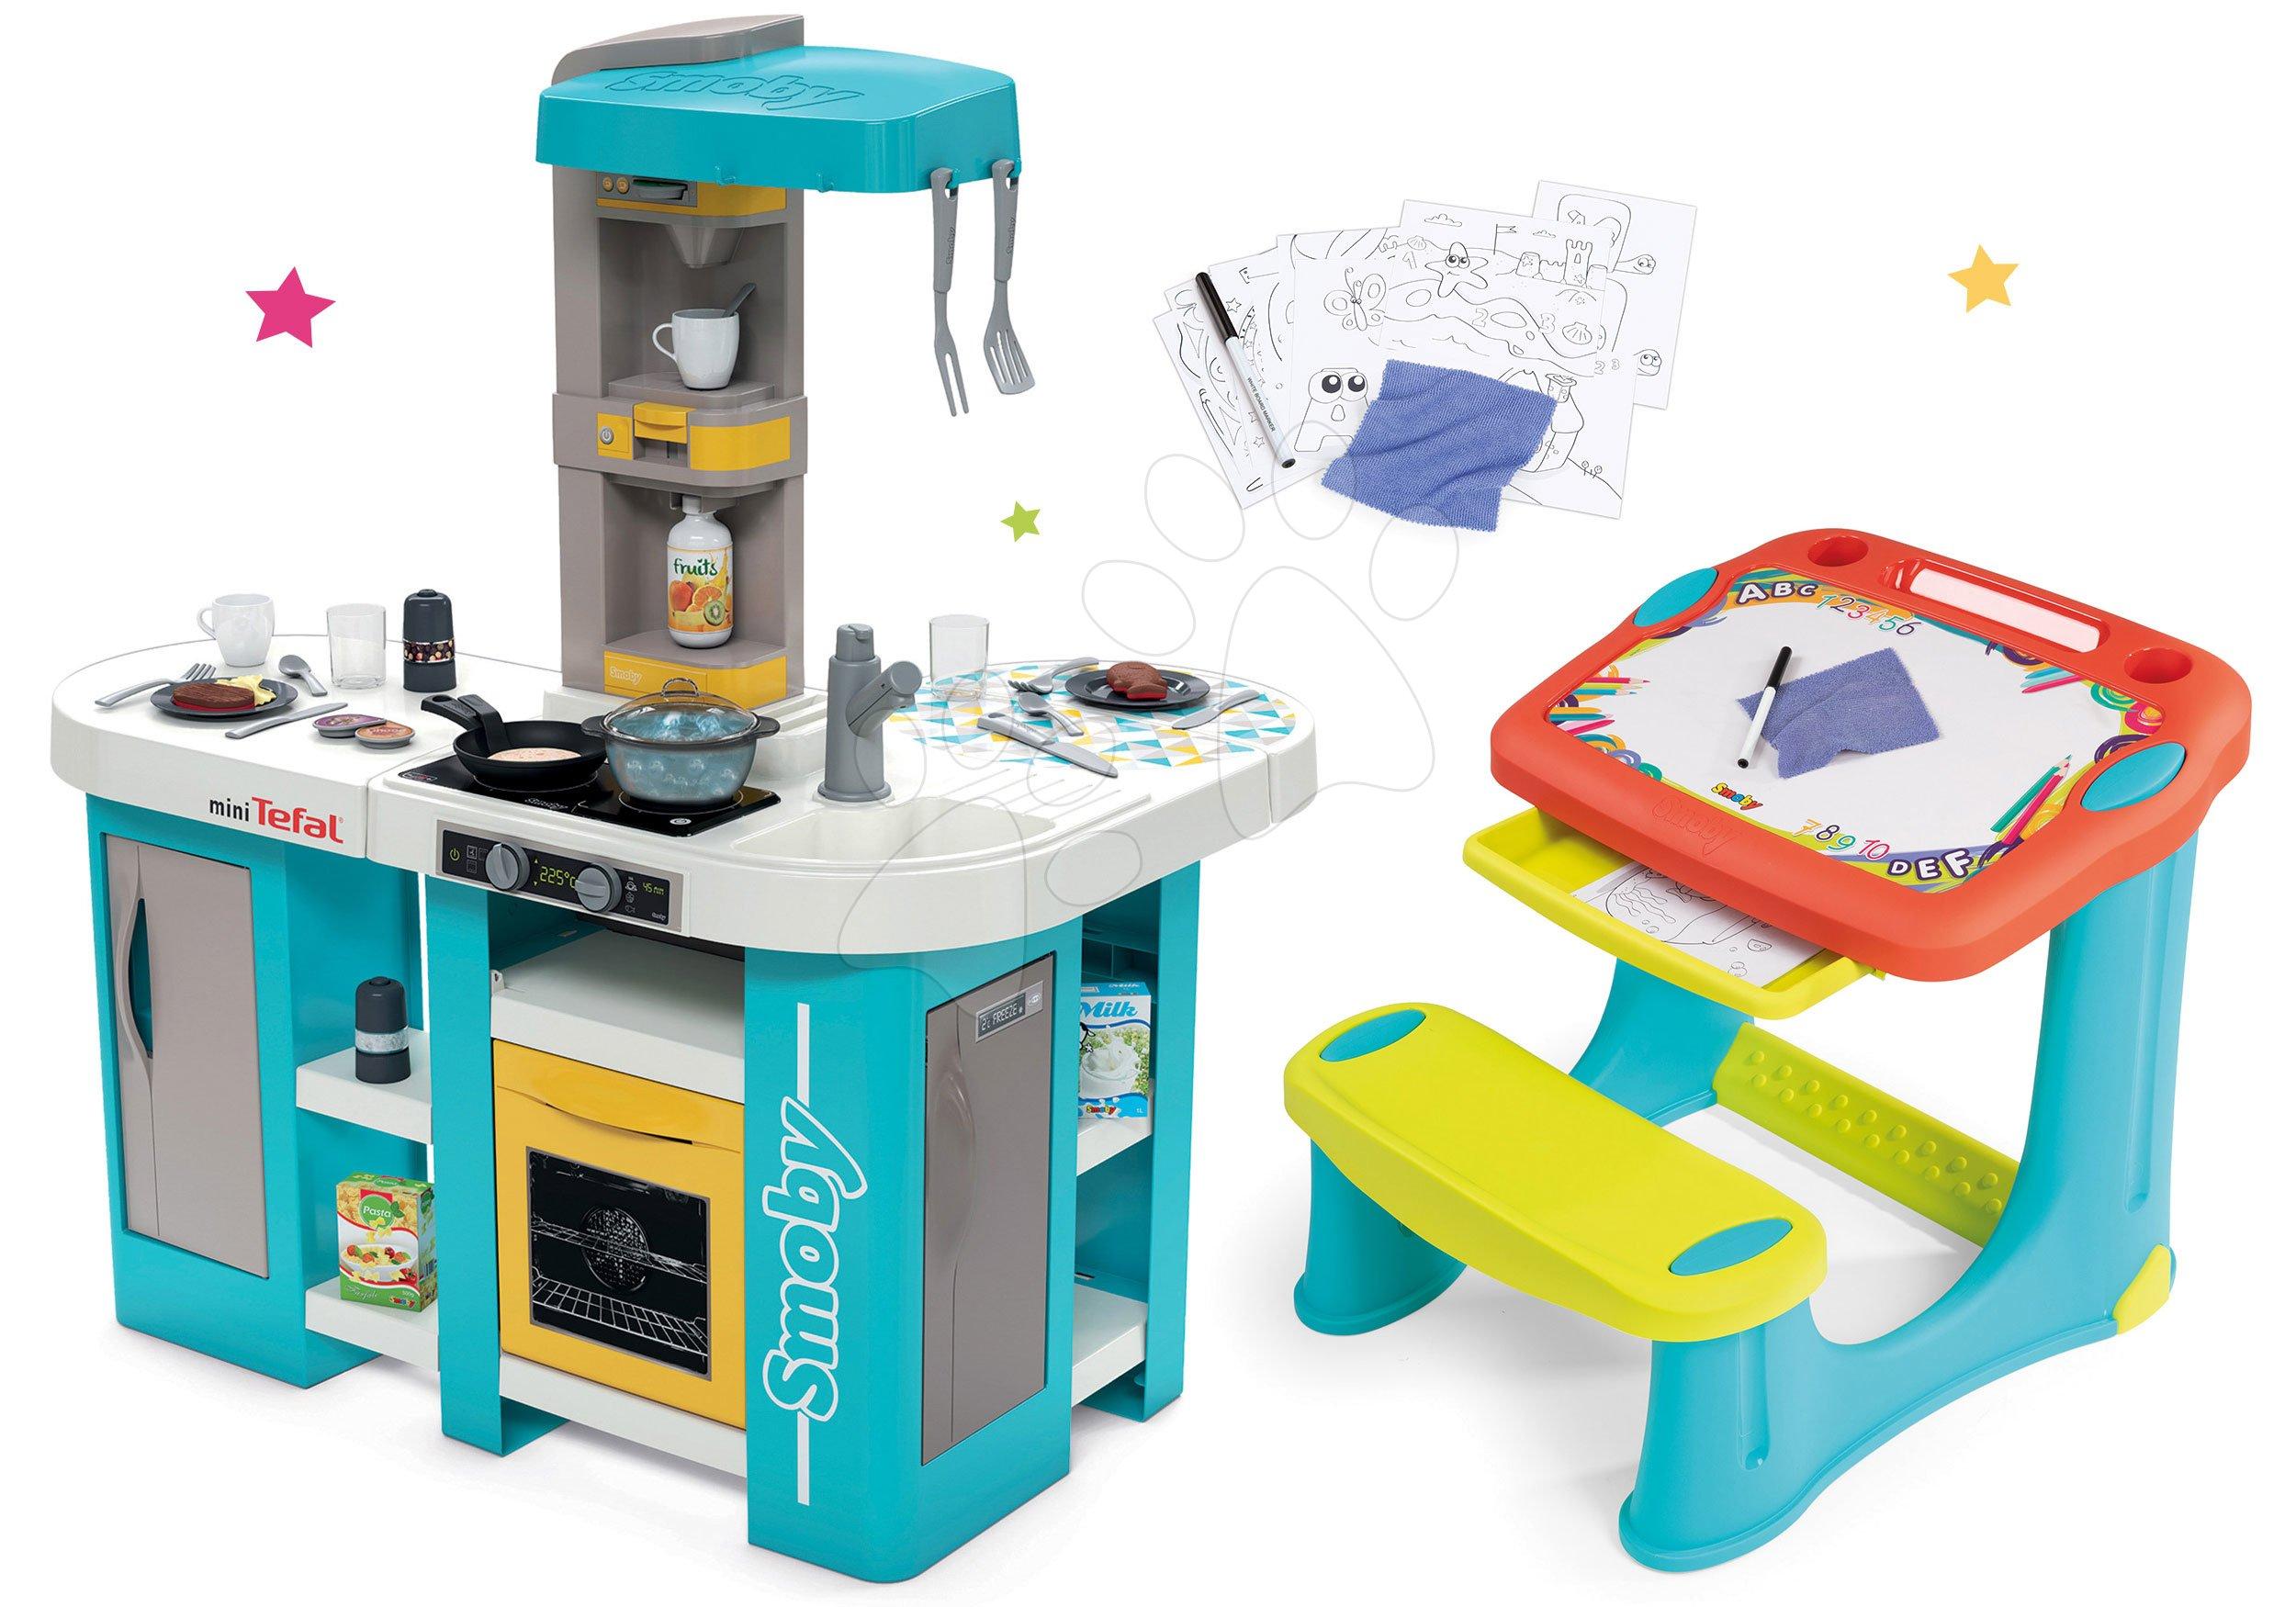 Set kuchynka elektronická Tefal Studio 360° XL Bubble Smoby a lavica na kreslenie Magic Desk Kresli a zmaž